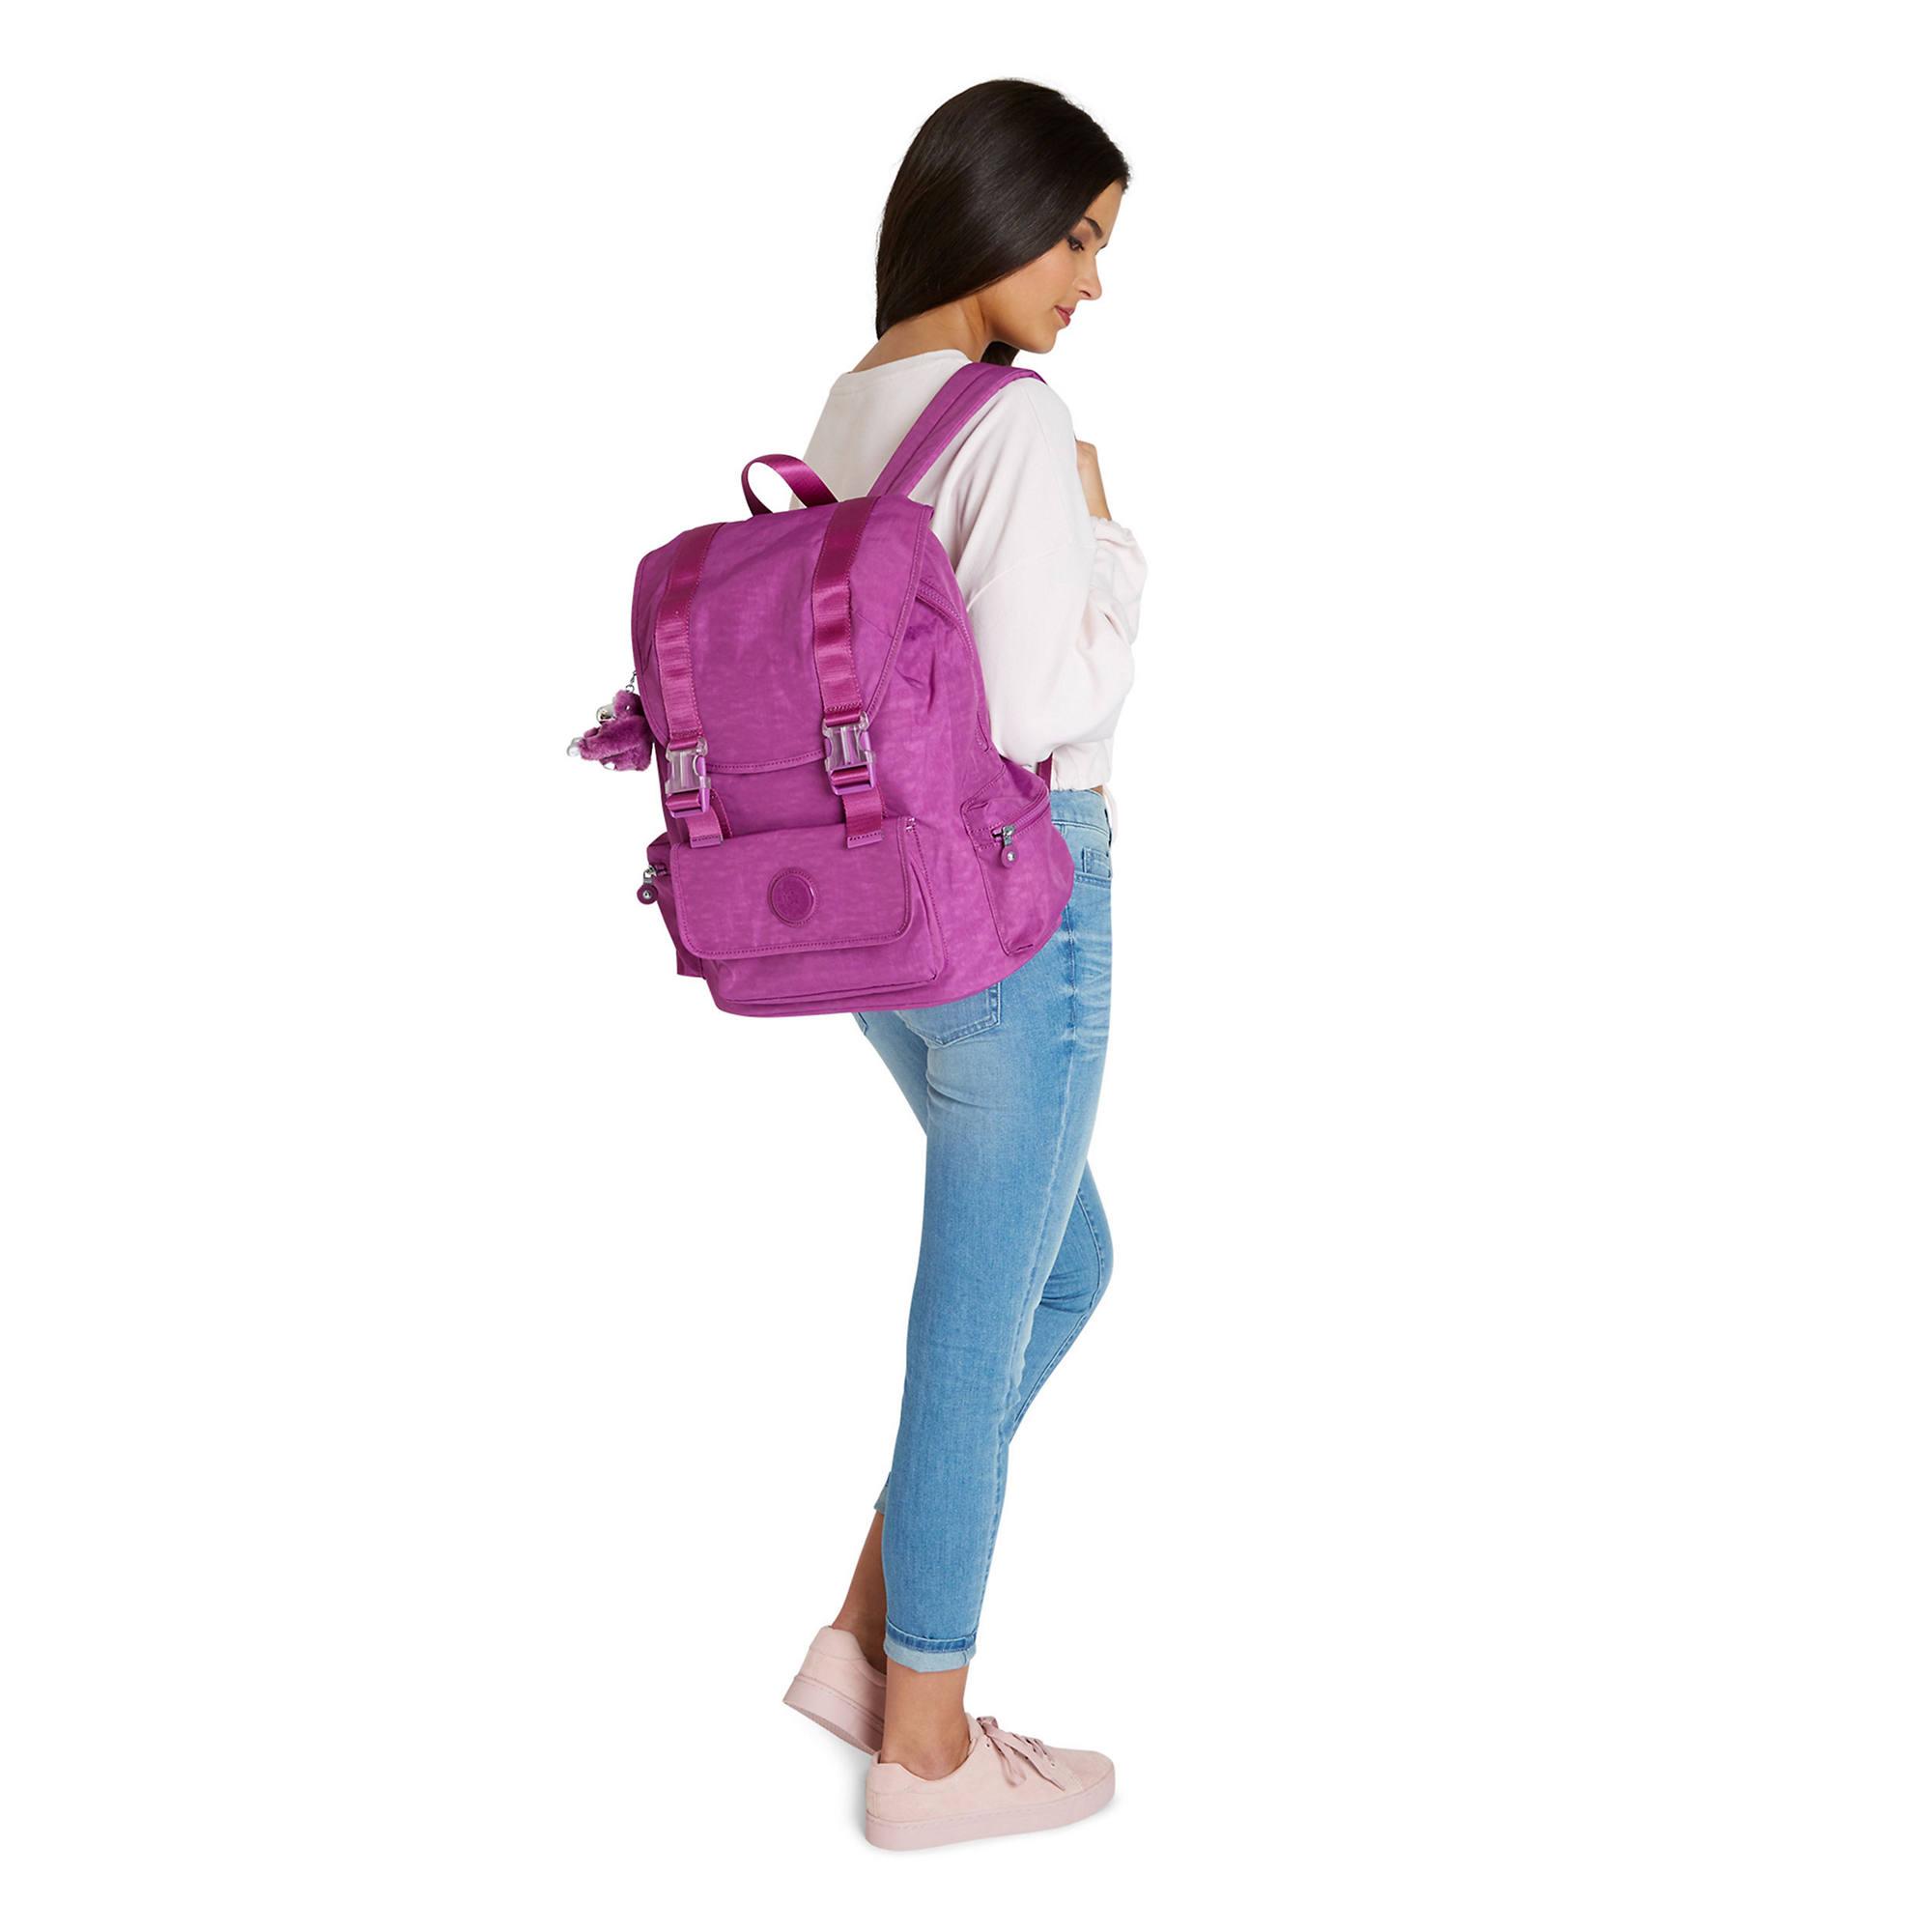 7d480d877 Siggy Large Laptop Backpack- Fenix Toulouse Handball